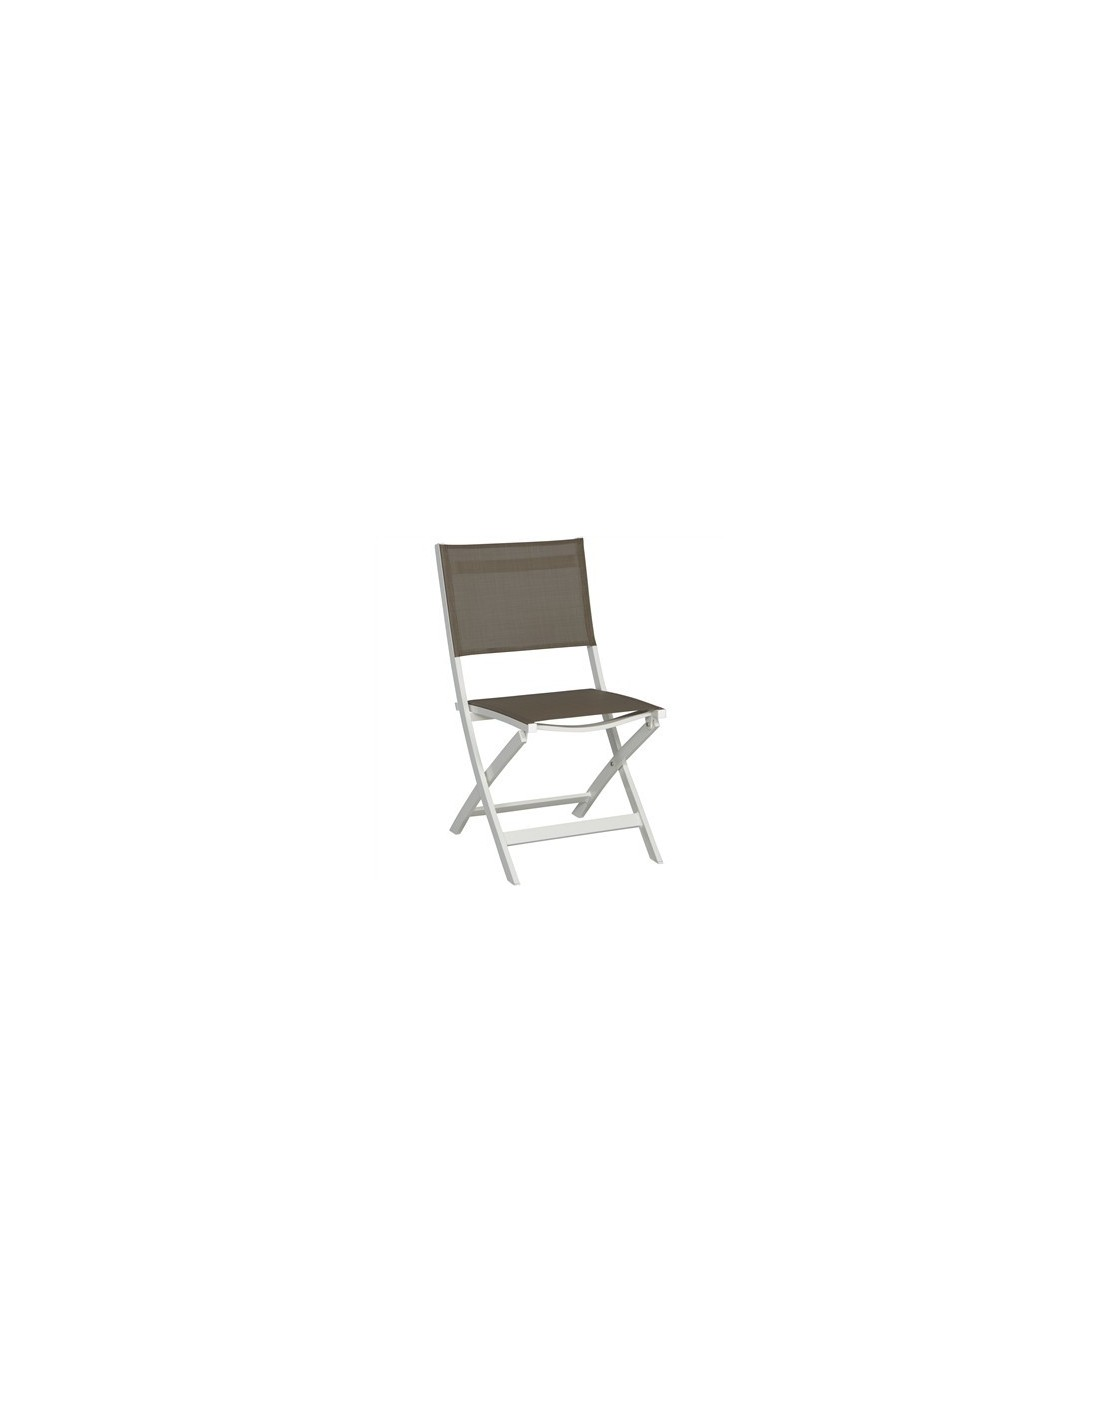 Chaise pliante stern joe structure aluminium blanc for Chaise aluminium textilene